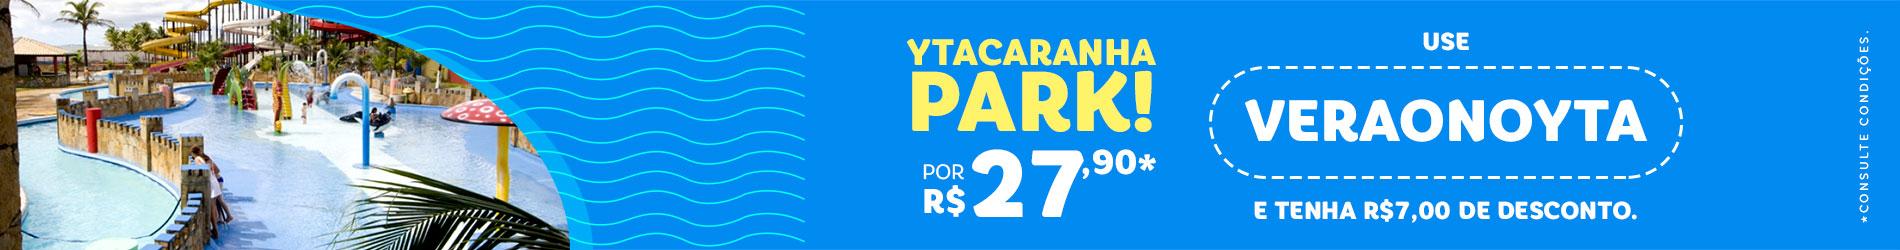 Ytacaranha Park